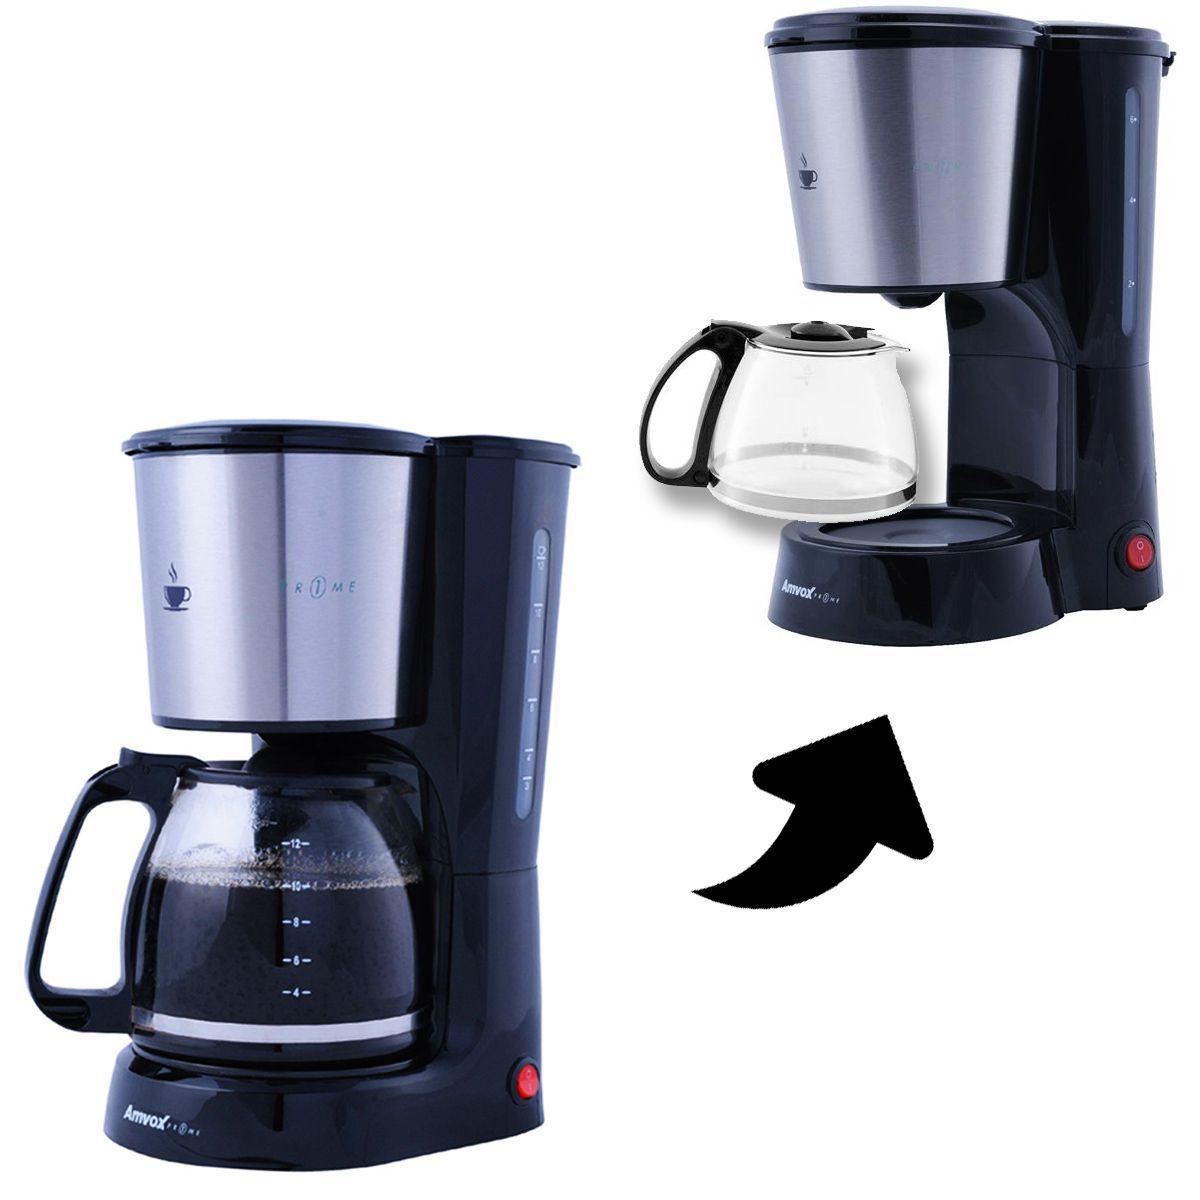 Cafeteira Elétrica AMVOX Inox ACF 557 800W